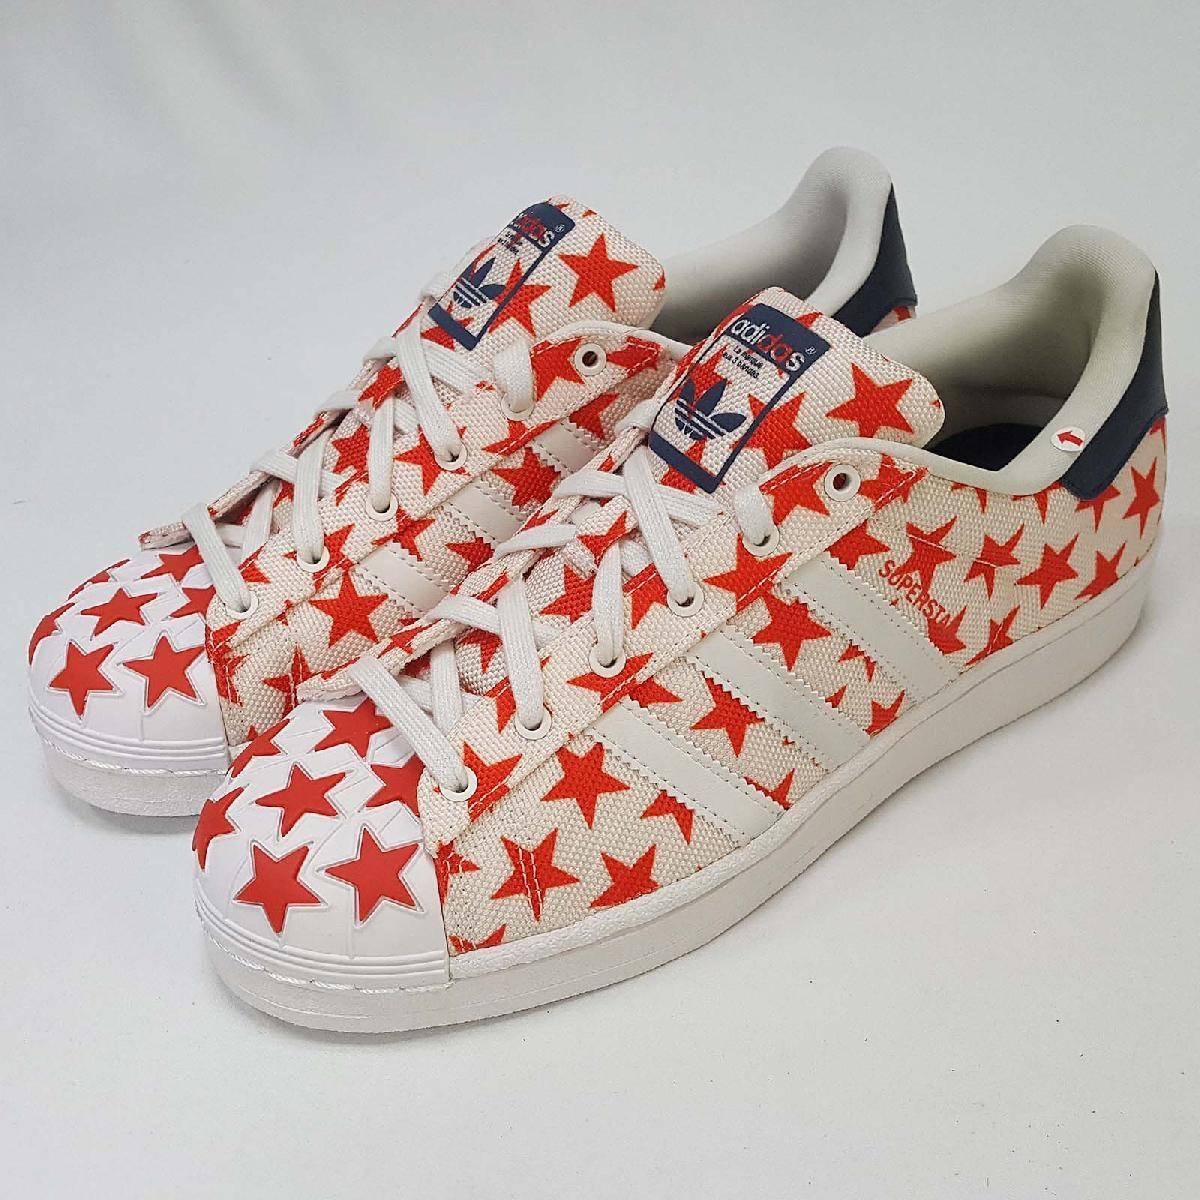 【NG出清】adidas 休閒鞋 Superstar Shell Toe Pack 米白 紅 星星 男鞋小尺寸 左腳內裏輕微發黃【PUMP306】